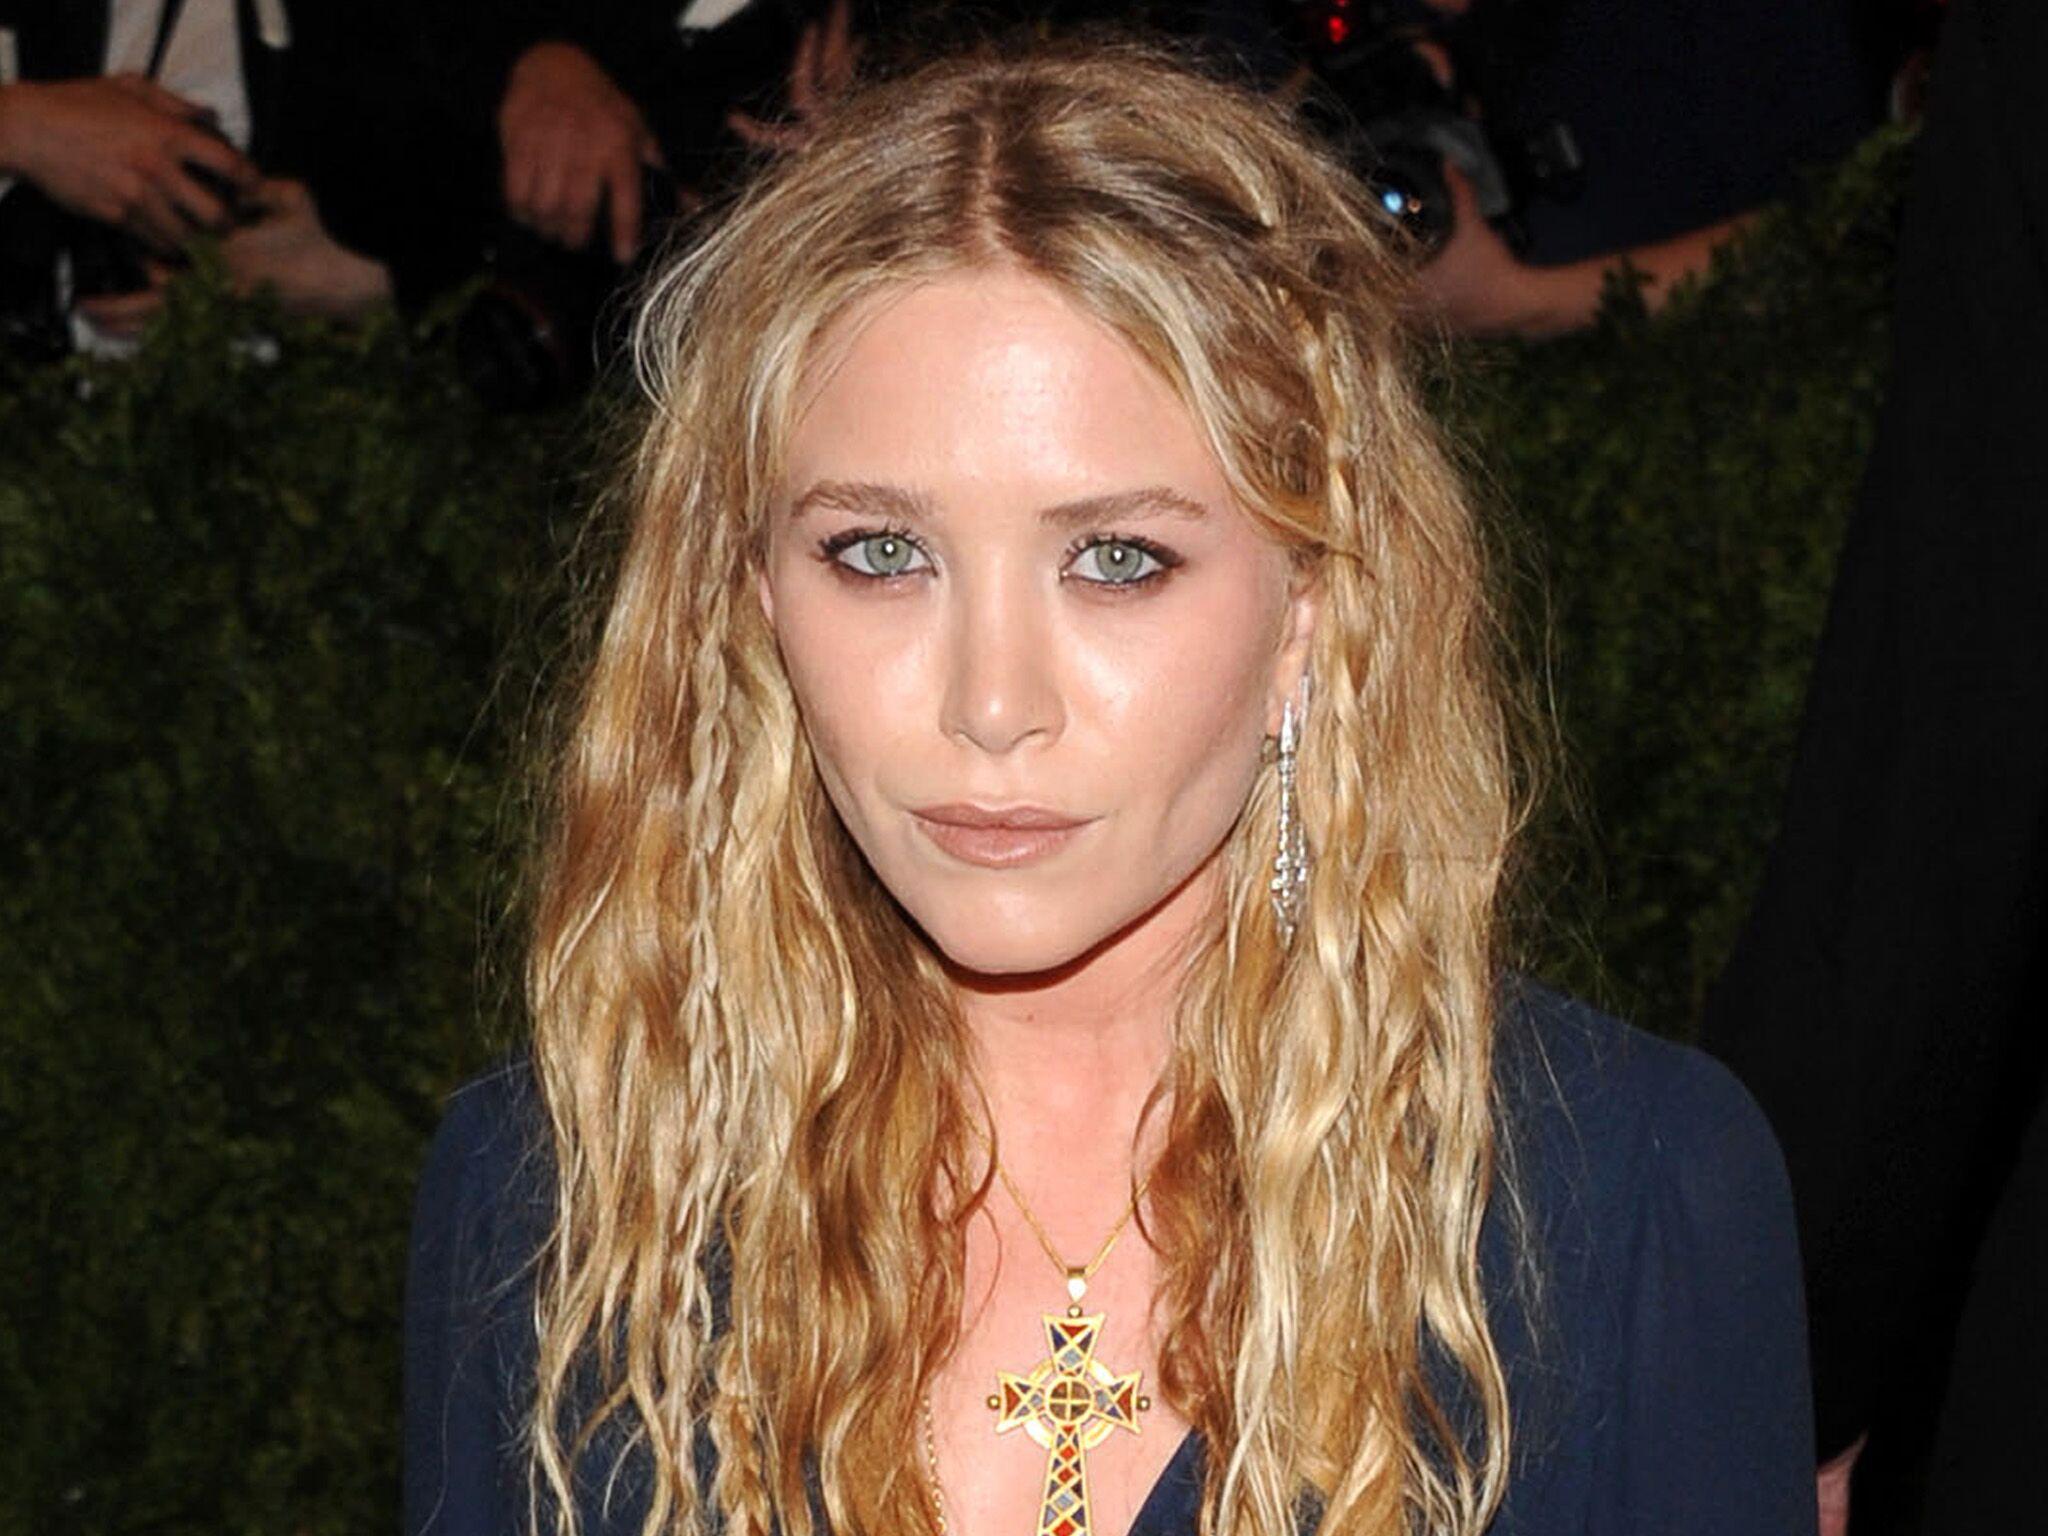 qui est Mary Kate Olsen datant maintenant